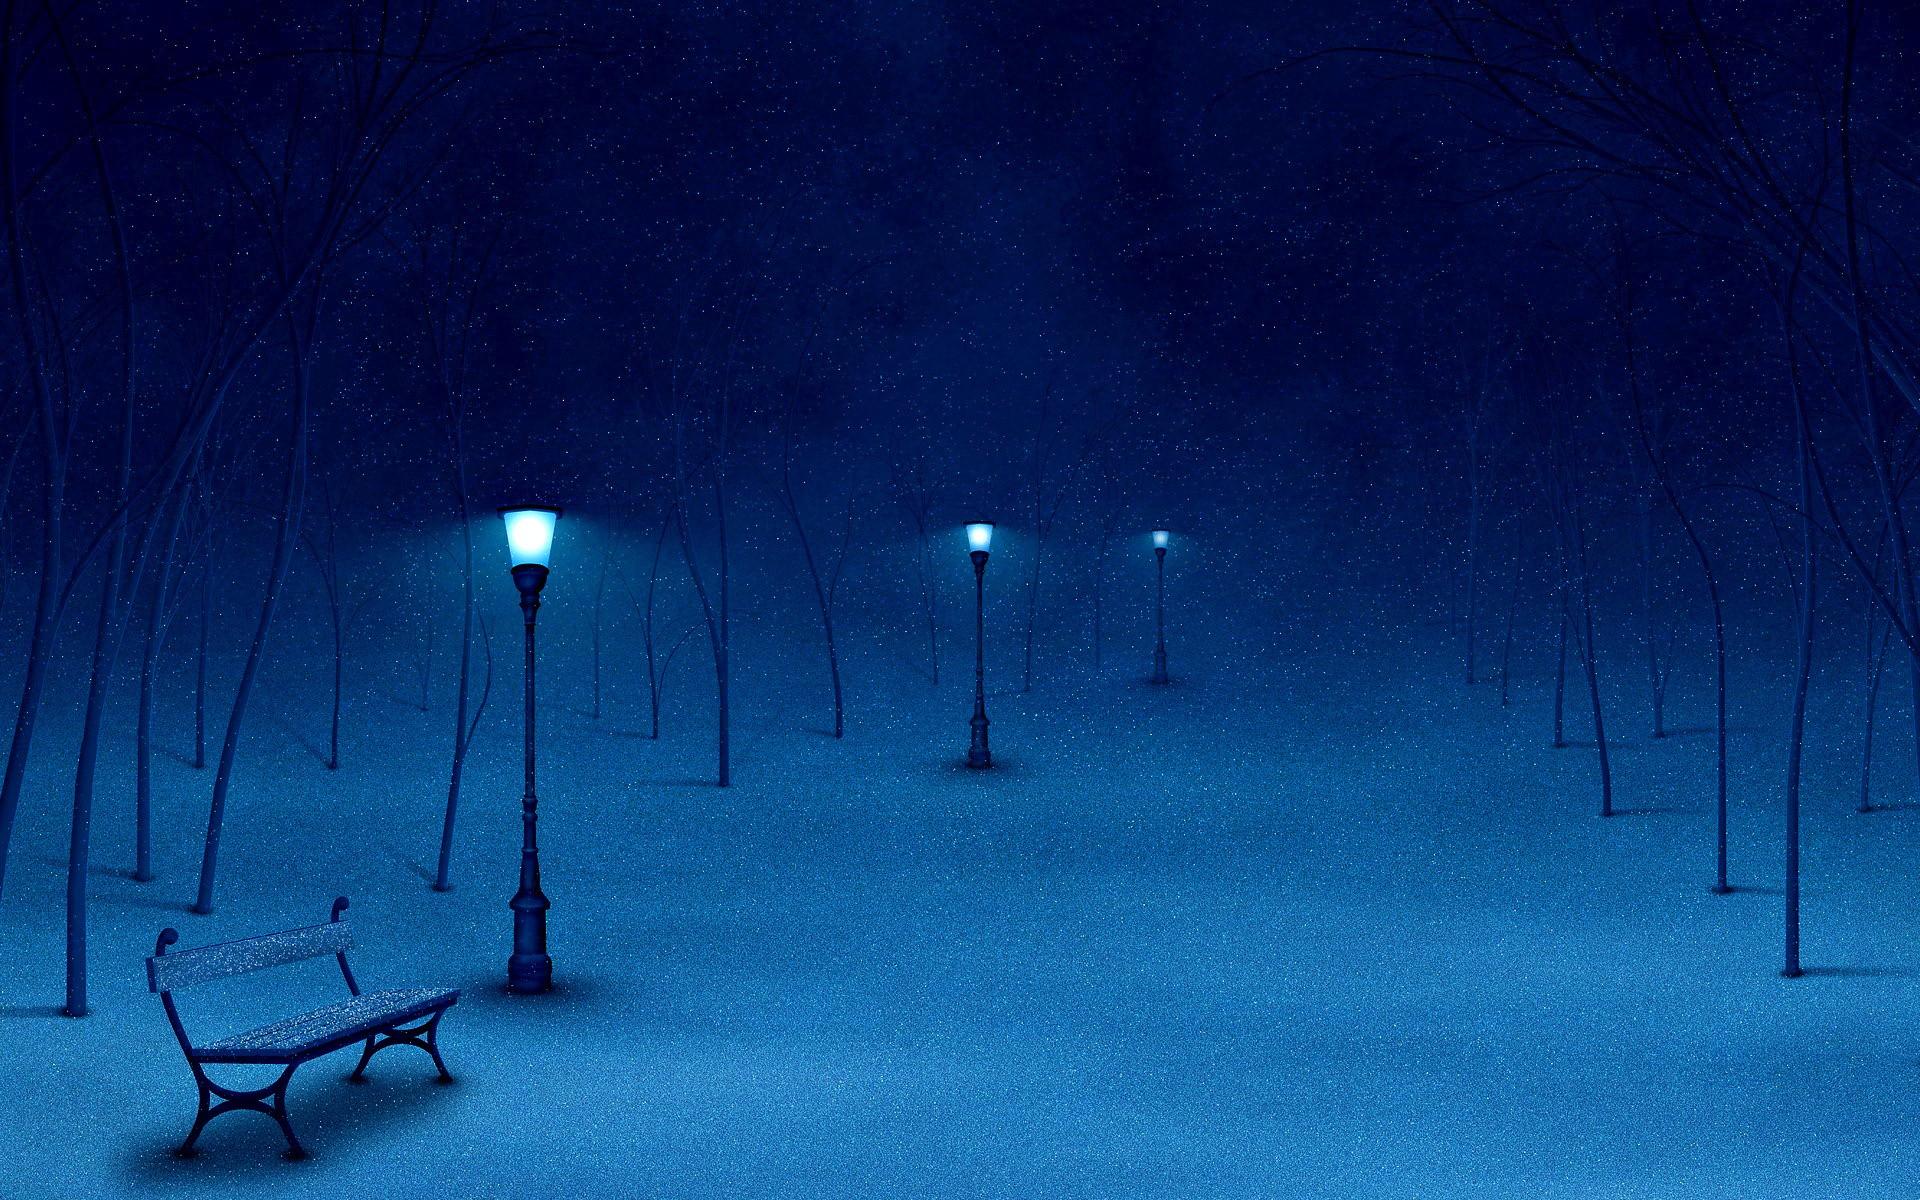 Night Winter Park Finland Wallpaper Wide Wallpaper WallpaperLepi 1920x1200